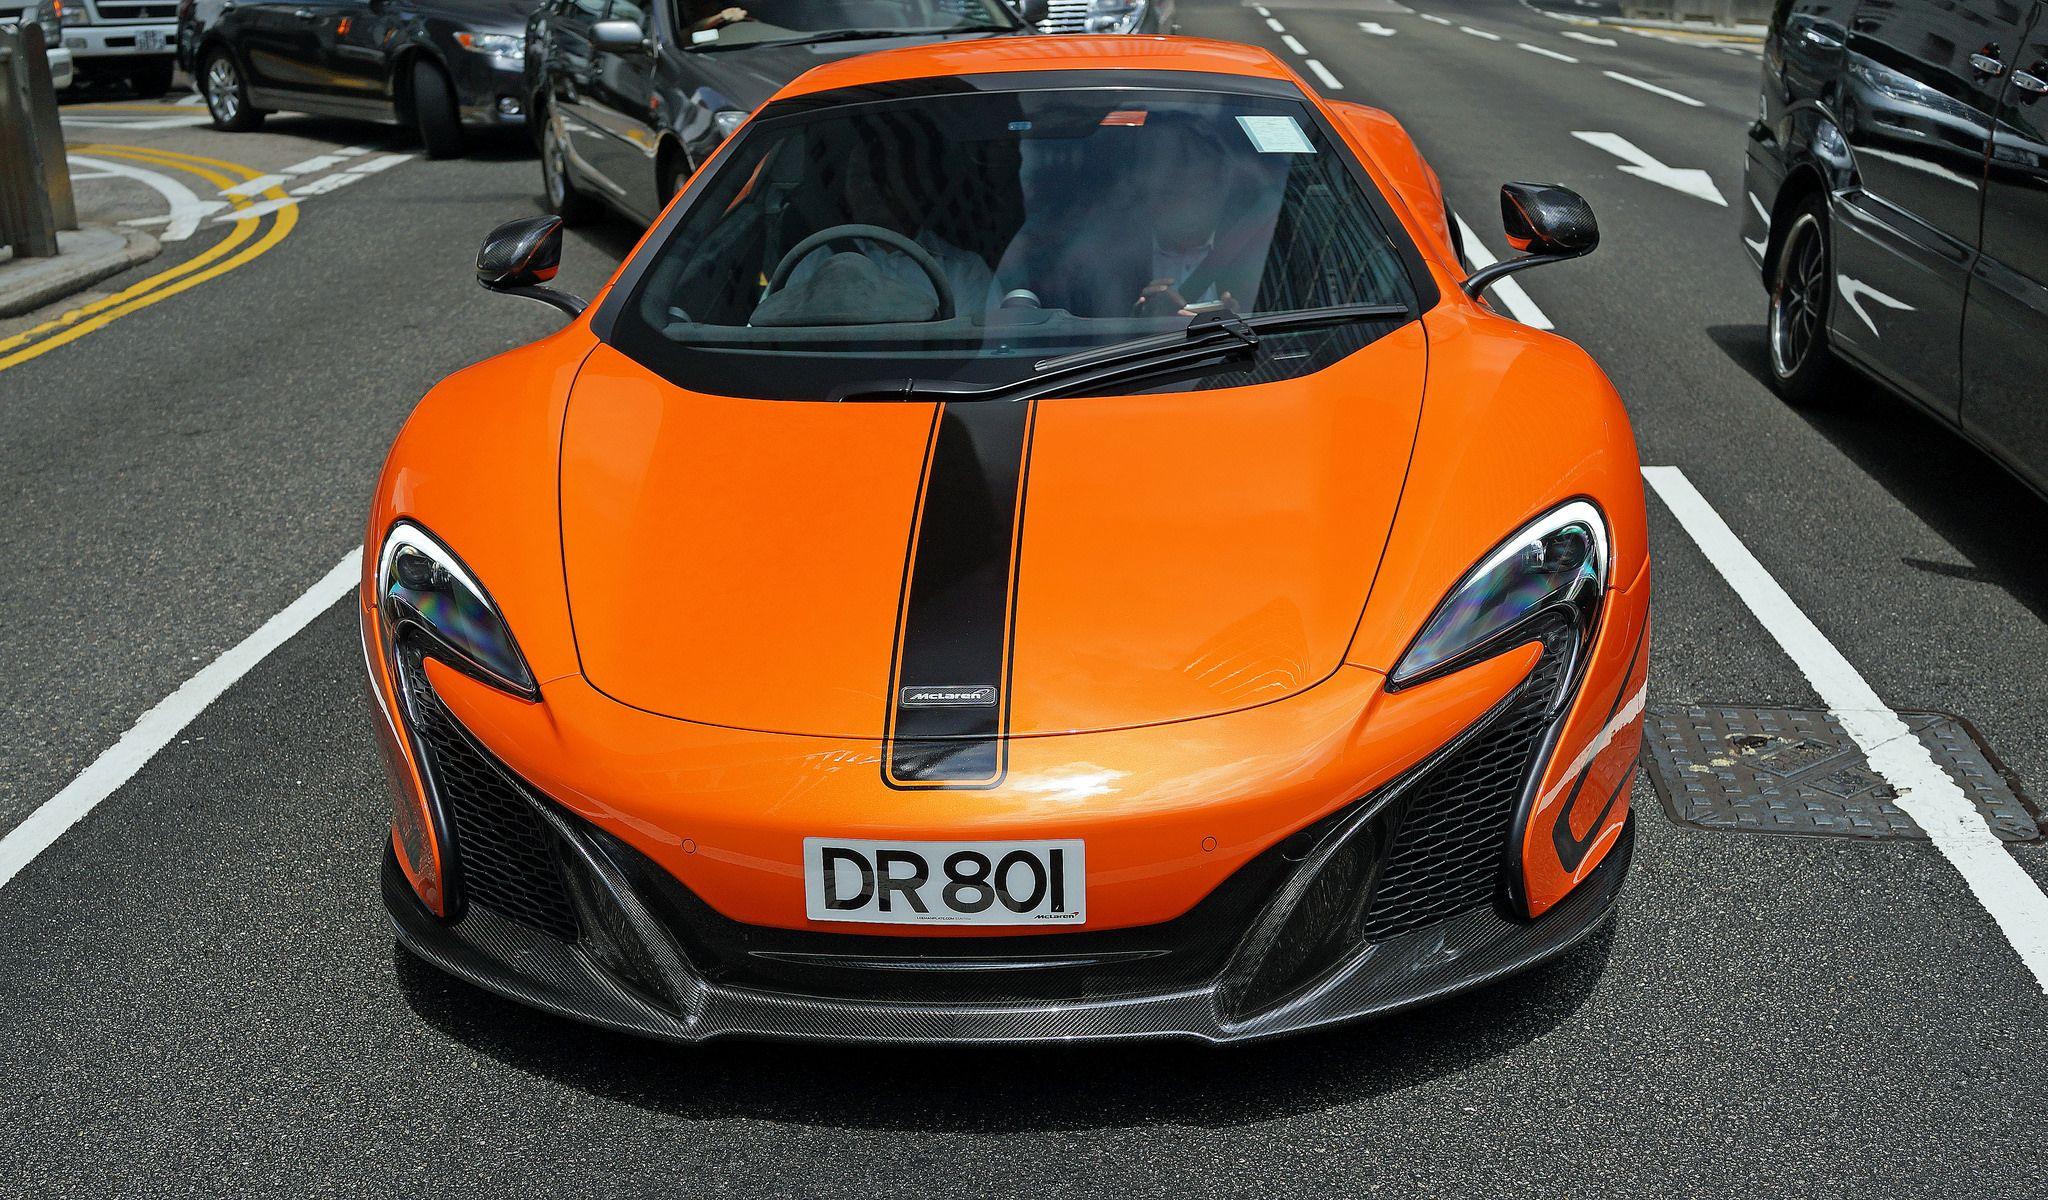 Car Number Plate Dr 801 Cool Sports Cars Mclaren Cars Super Cars